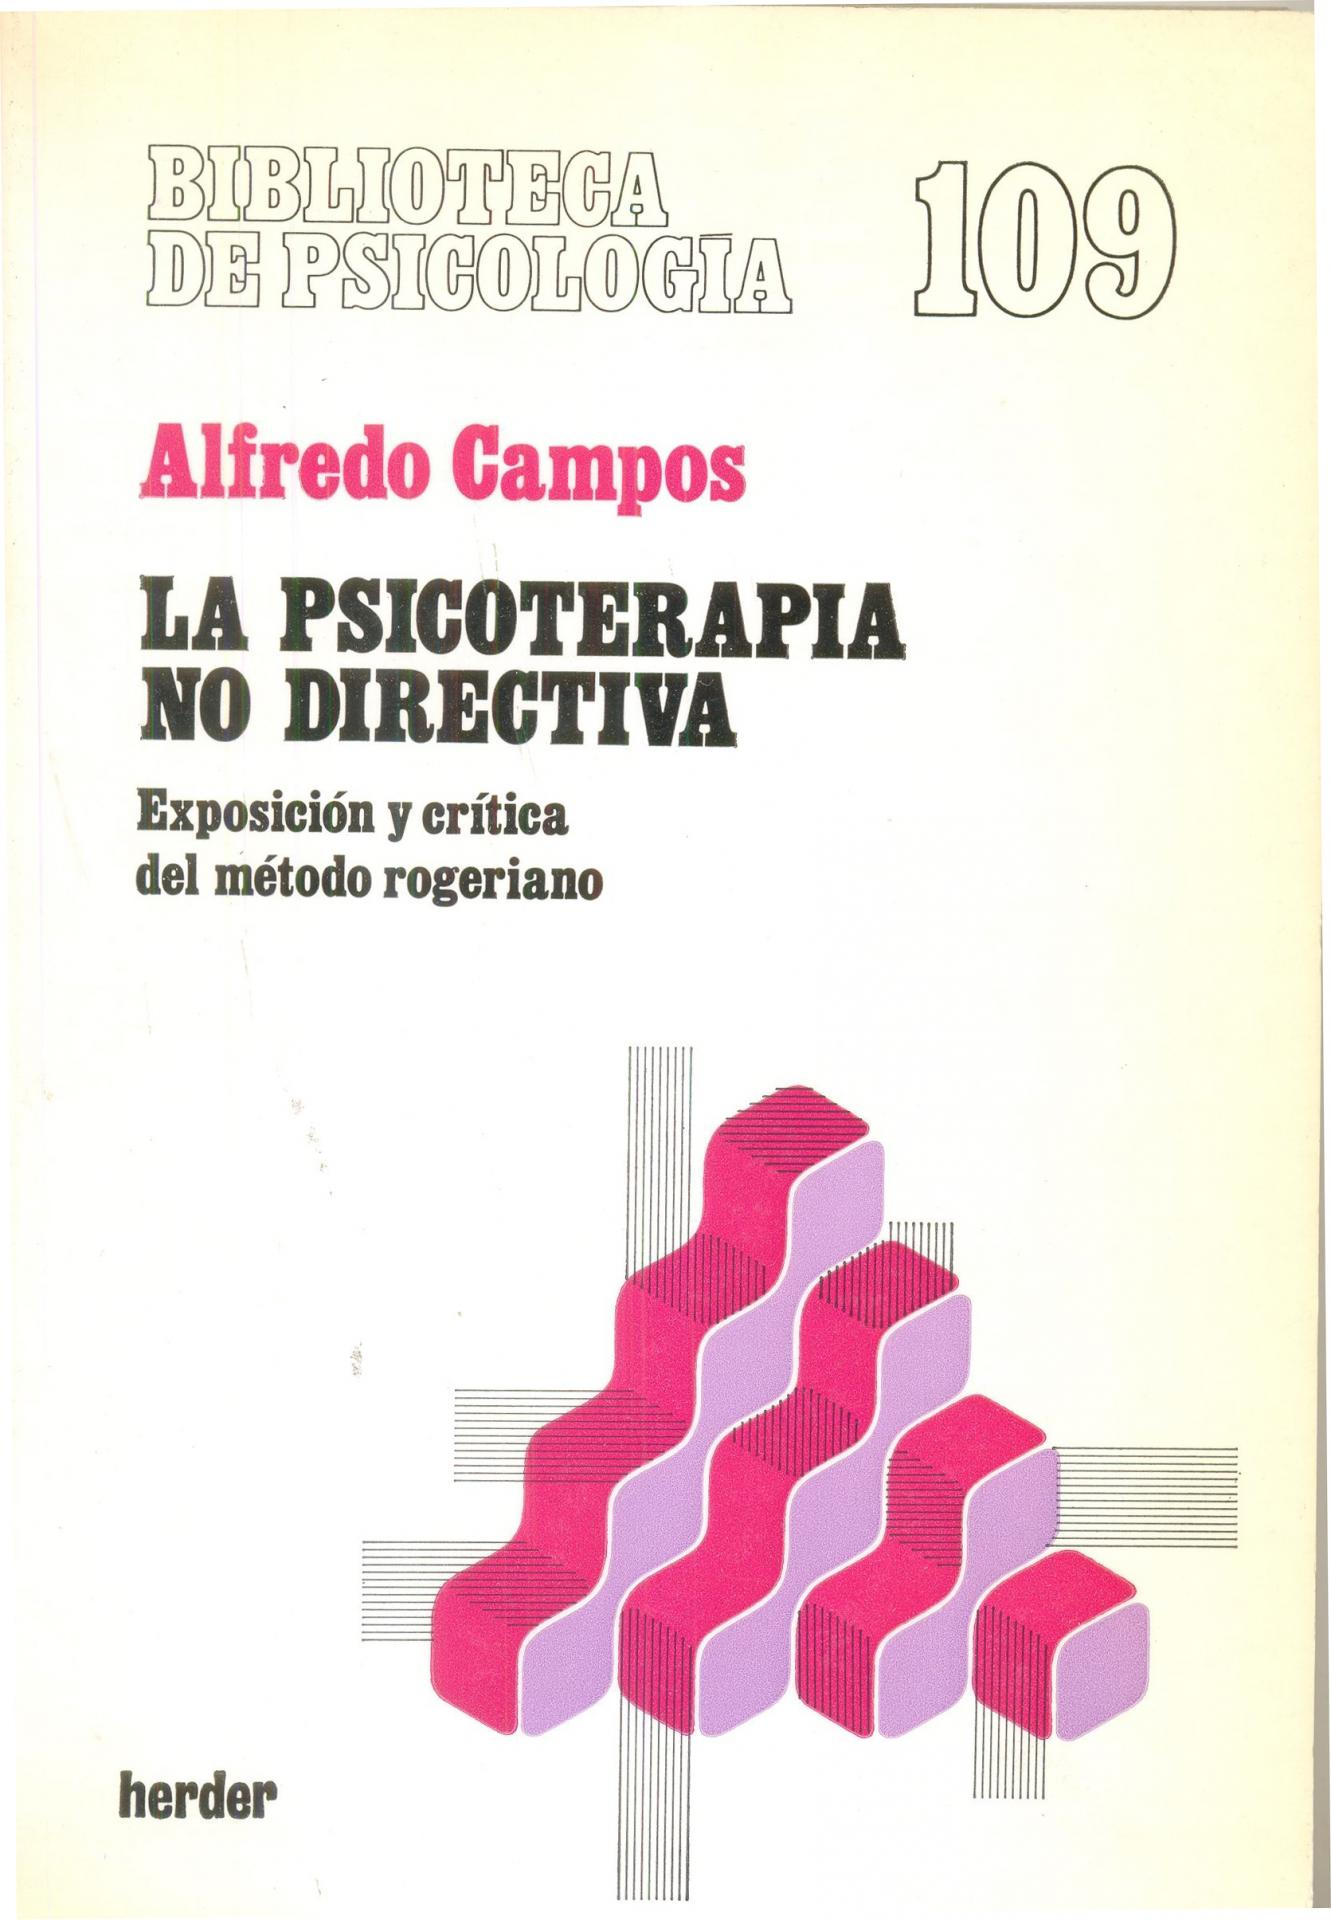 LA PSICOTERAPIA NO DIRECTIVA. Campos, A.